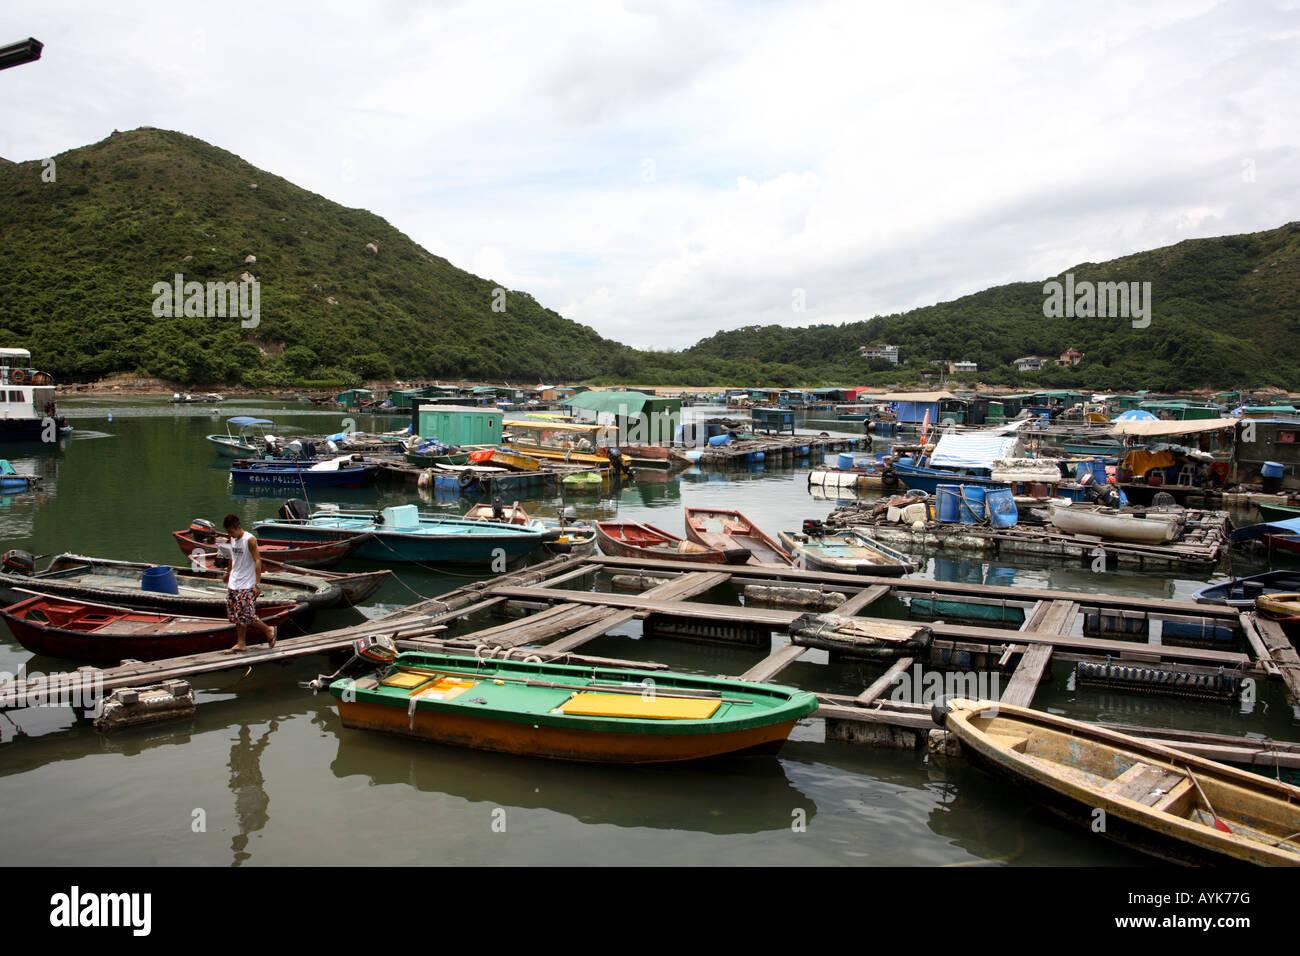 Boats in Sok Kwu Wan Harbour Lamma Island Hong Kong - Stock Image